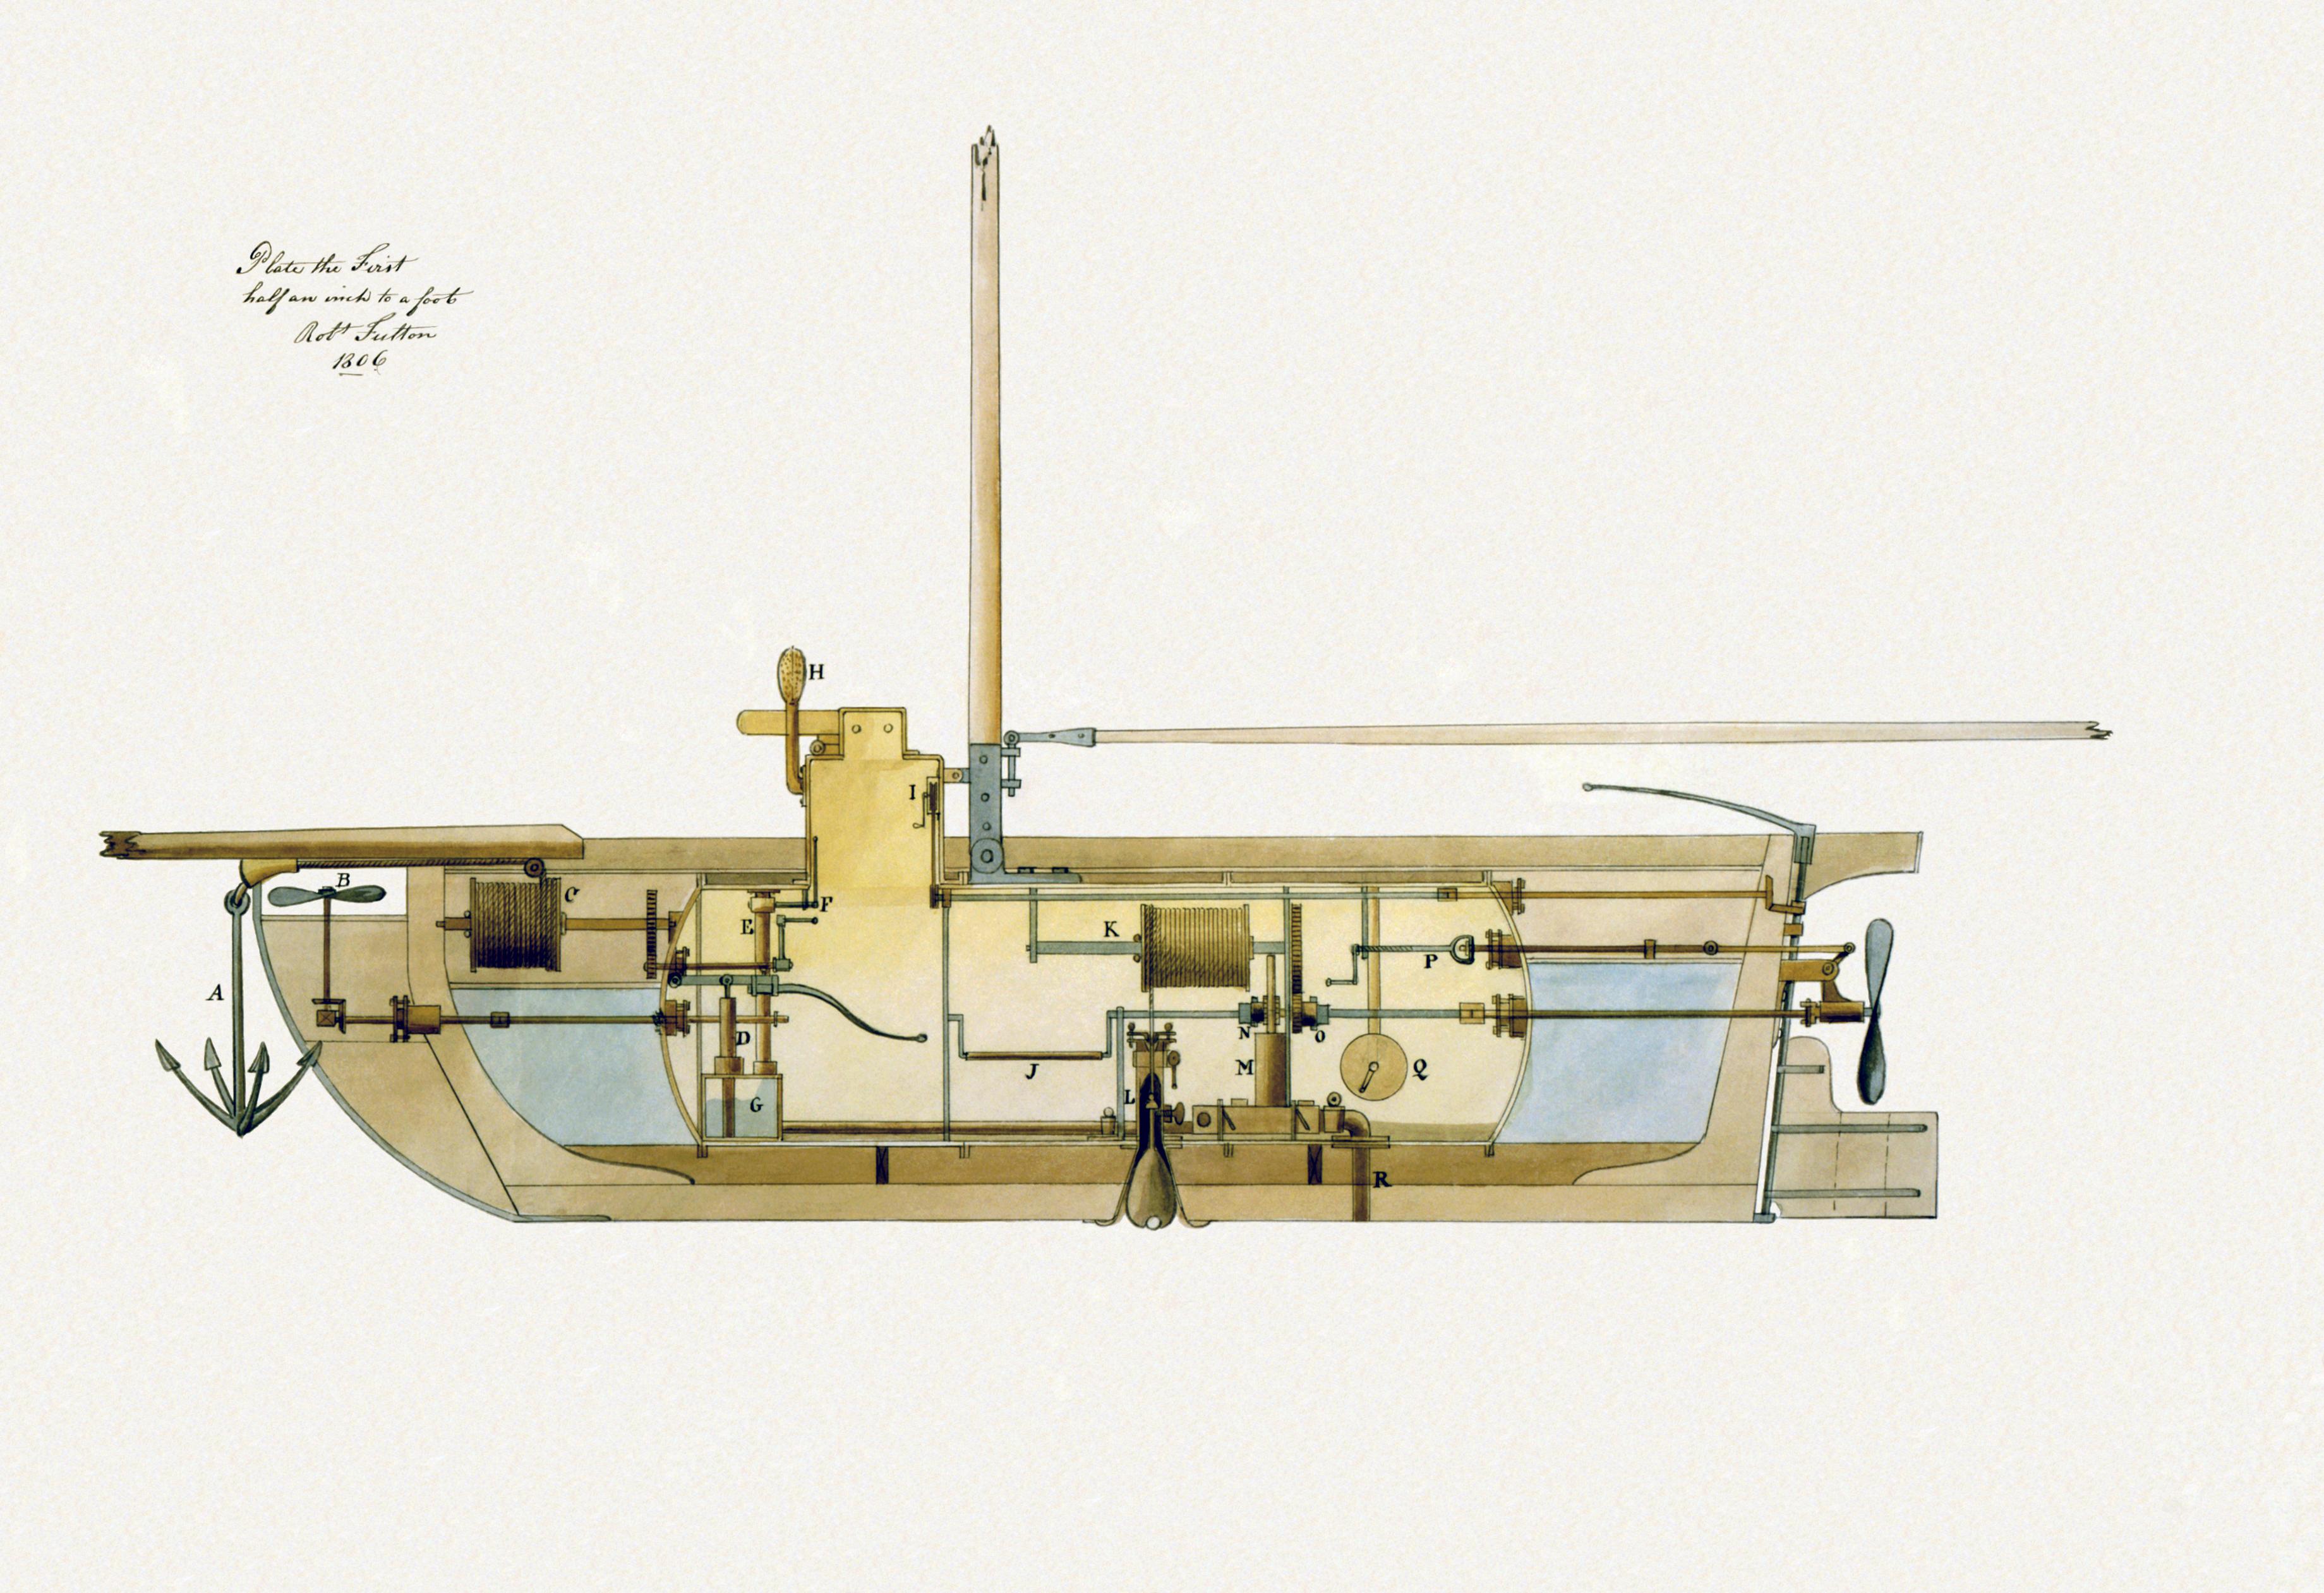 Marvelous History Of Submarines Wikipedia Evergreenethics Interior Chair Design Evergreenethicsorg